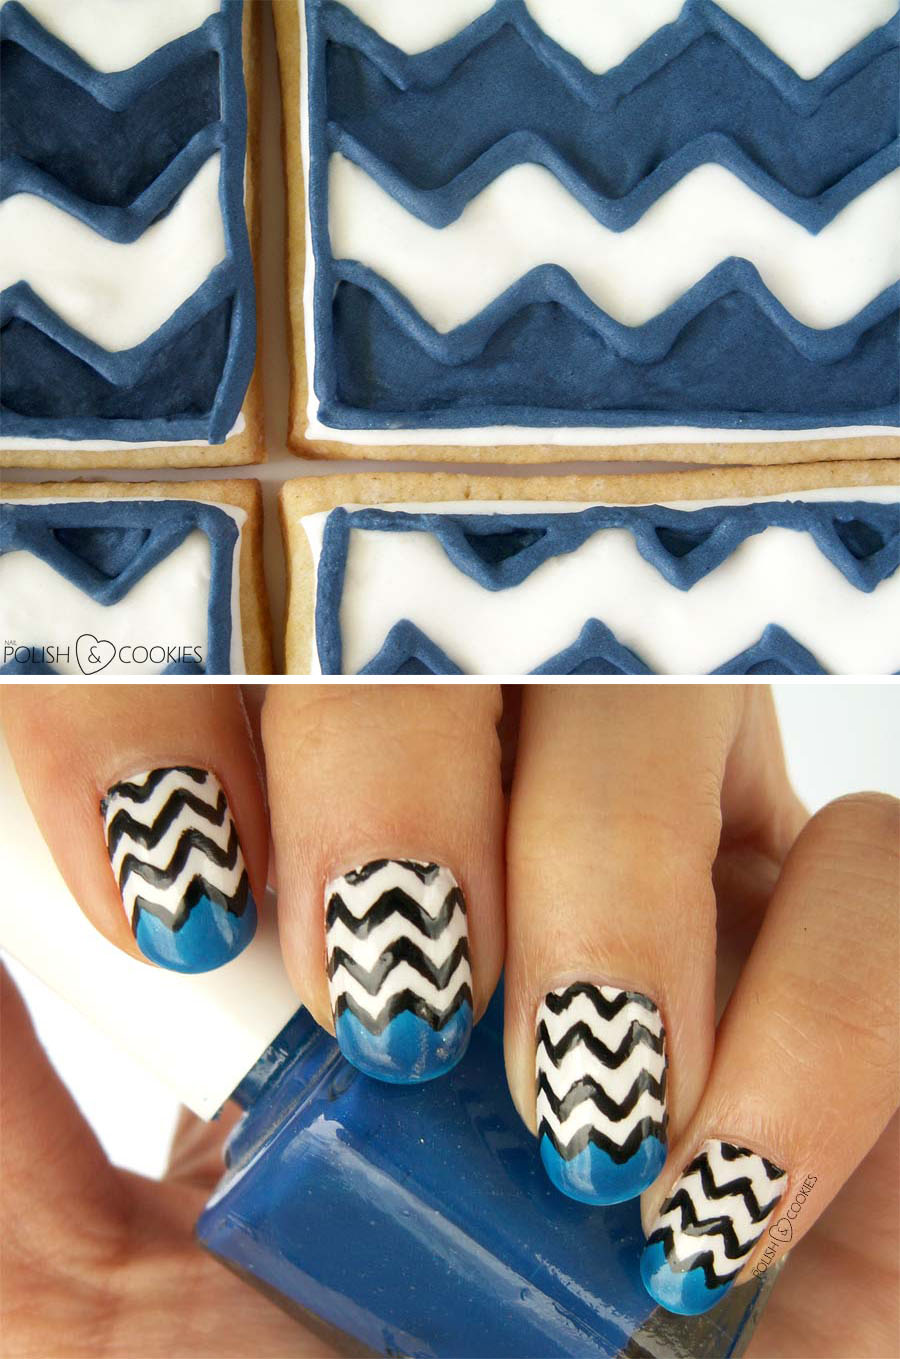 paznokcie i ciasteczka